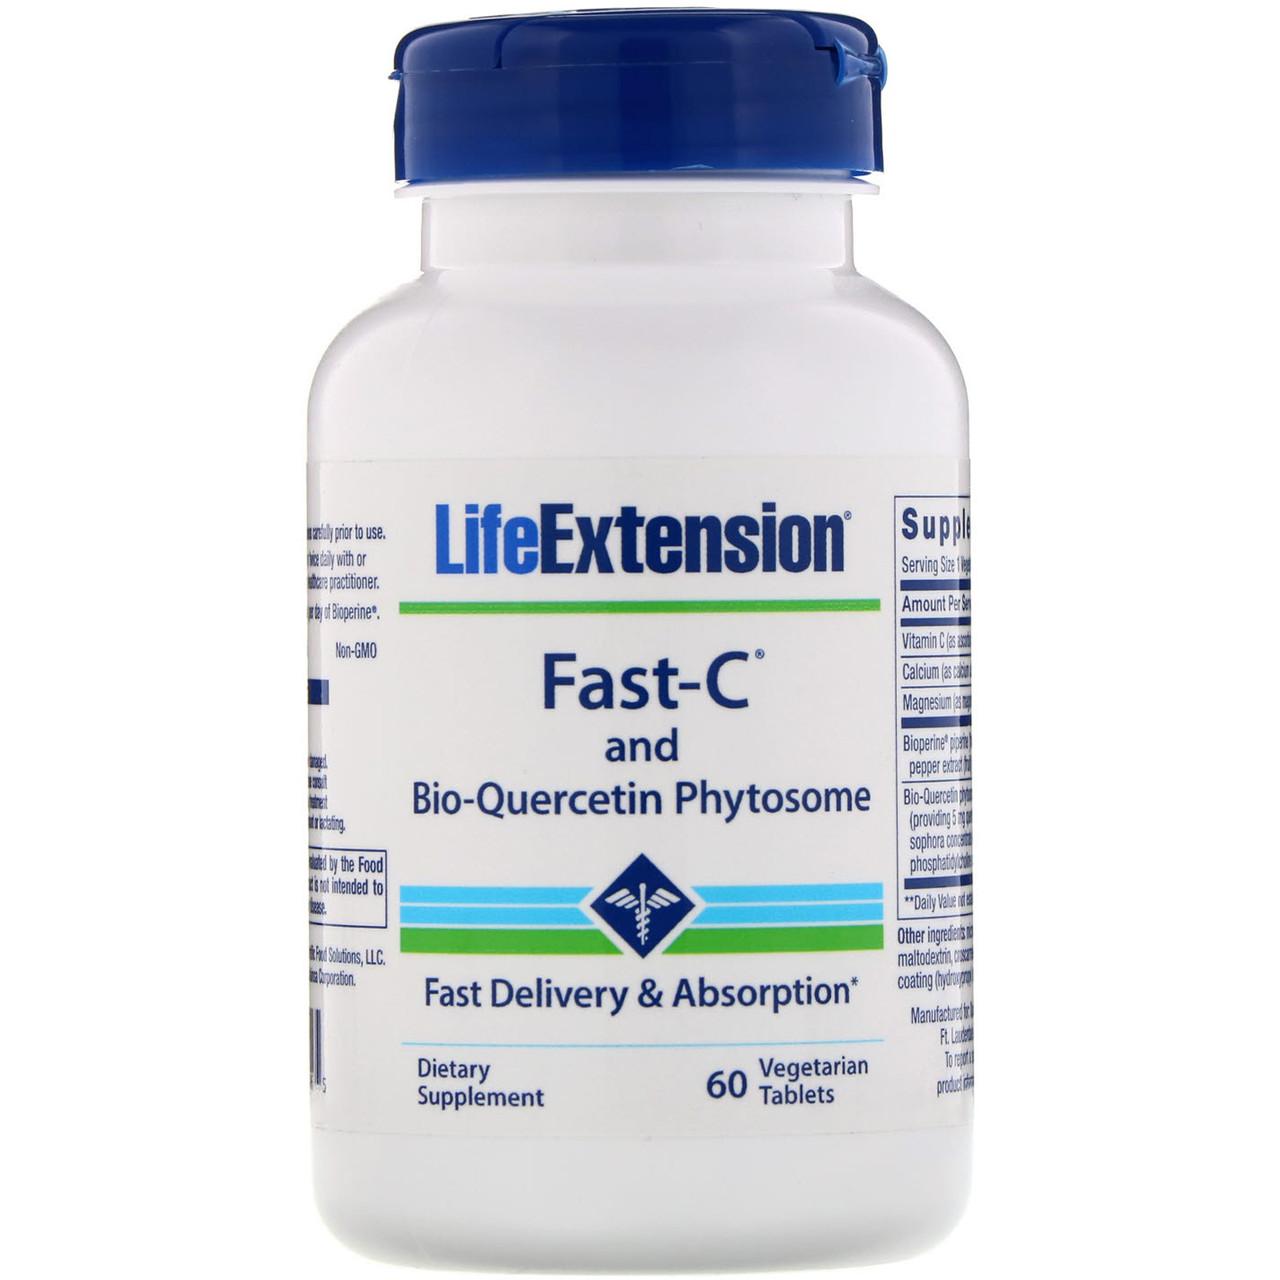 Витамины Fast-C с фитосомами биокверцетина от Life Extension, 60 вегетарианских таблеток